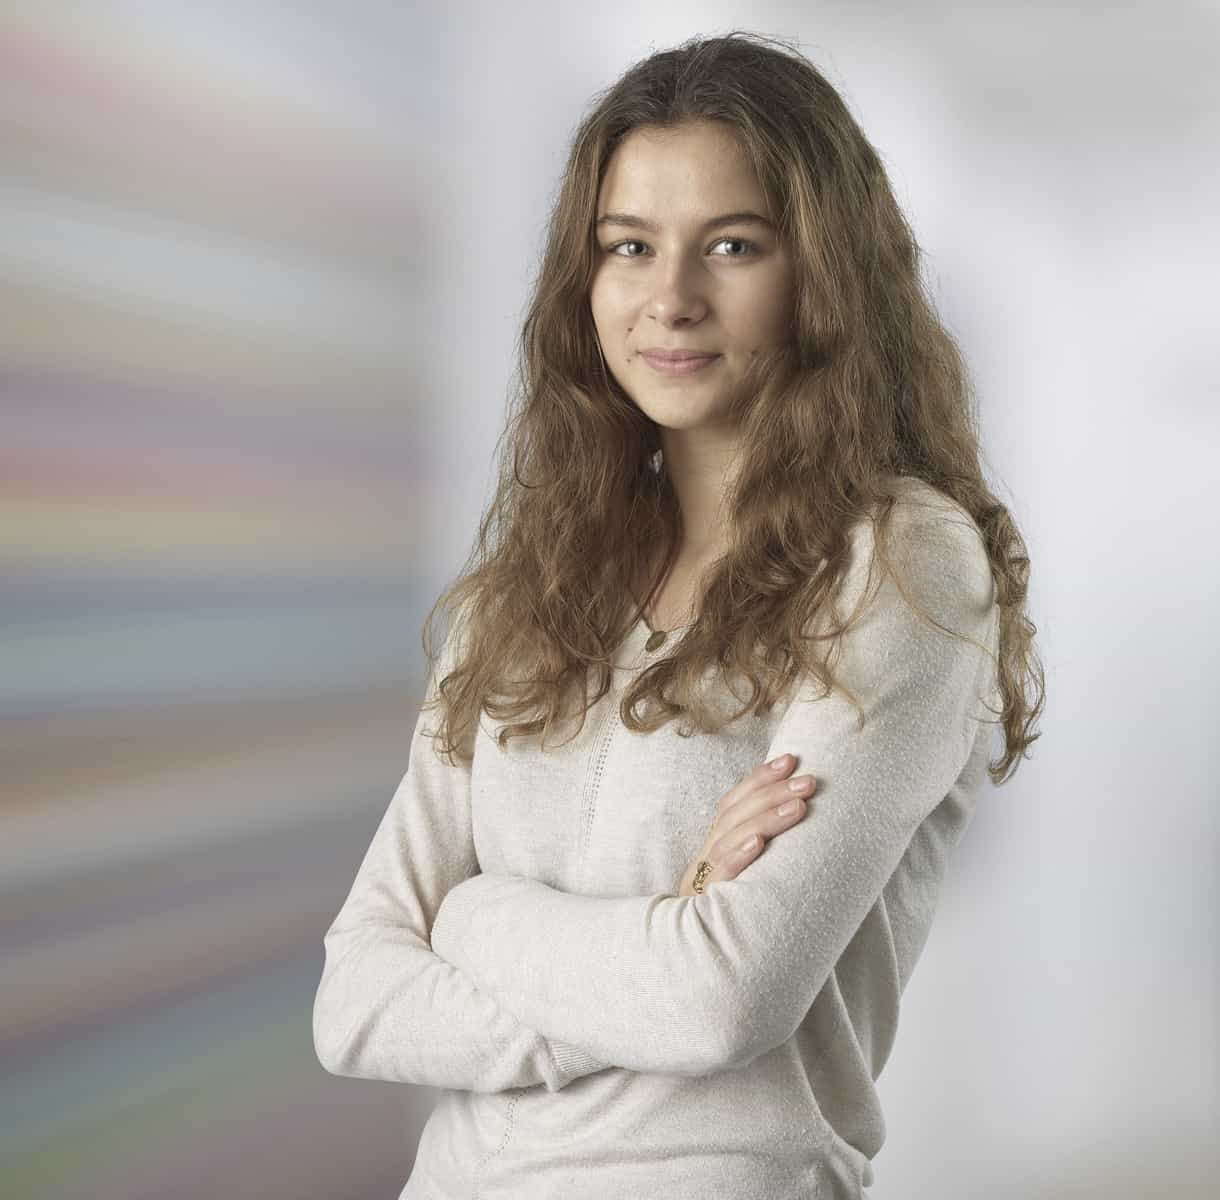 Laura Rothschild